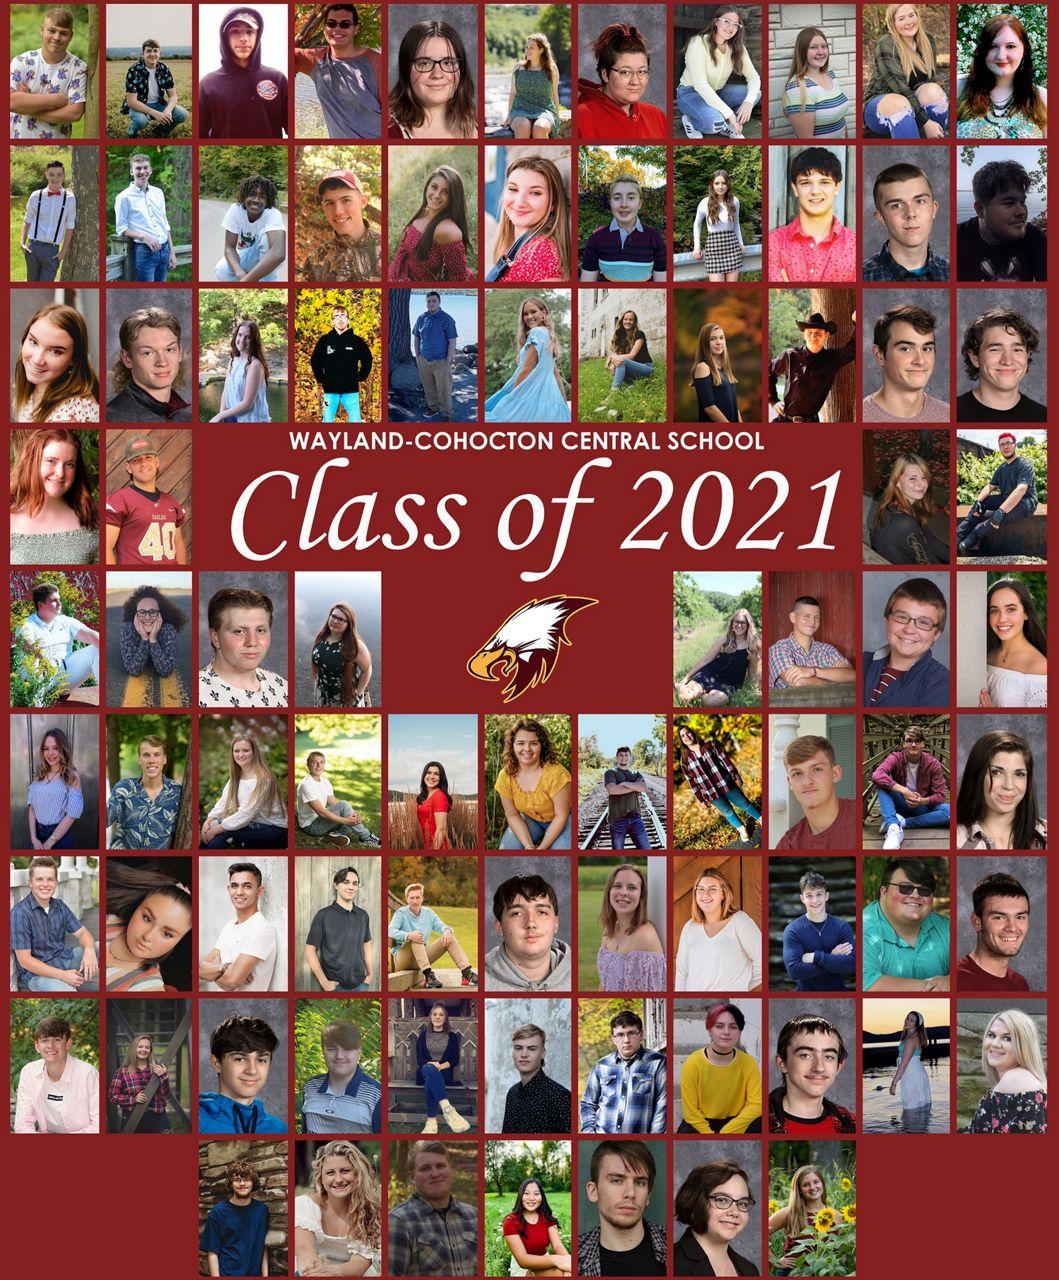 Class of 2021 Wayland Cohocton